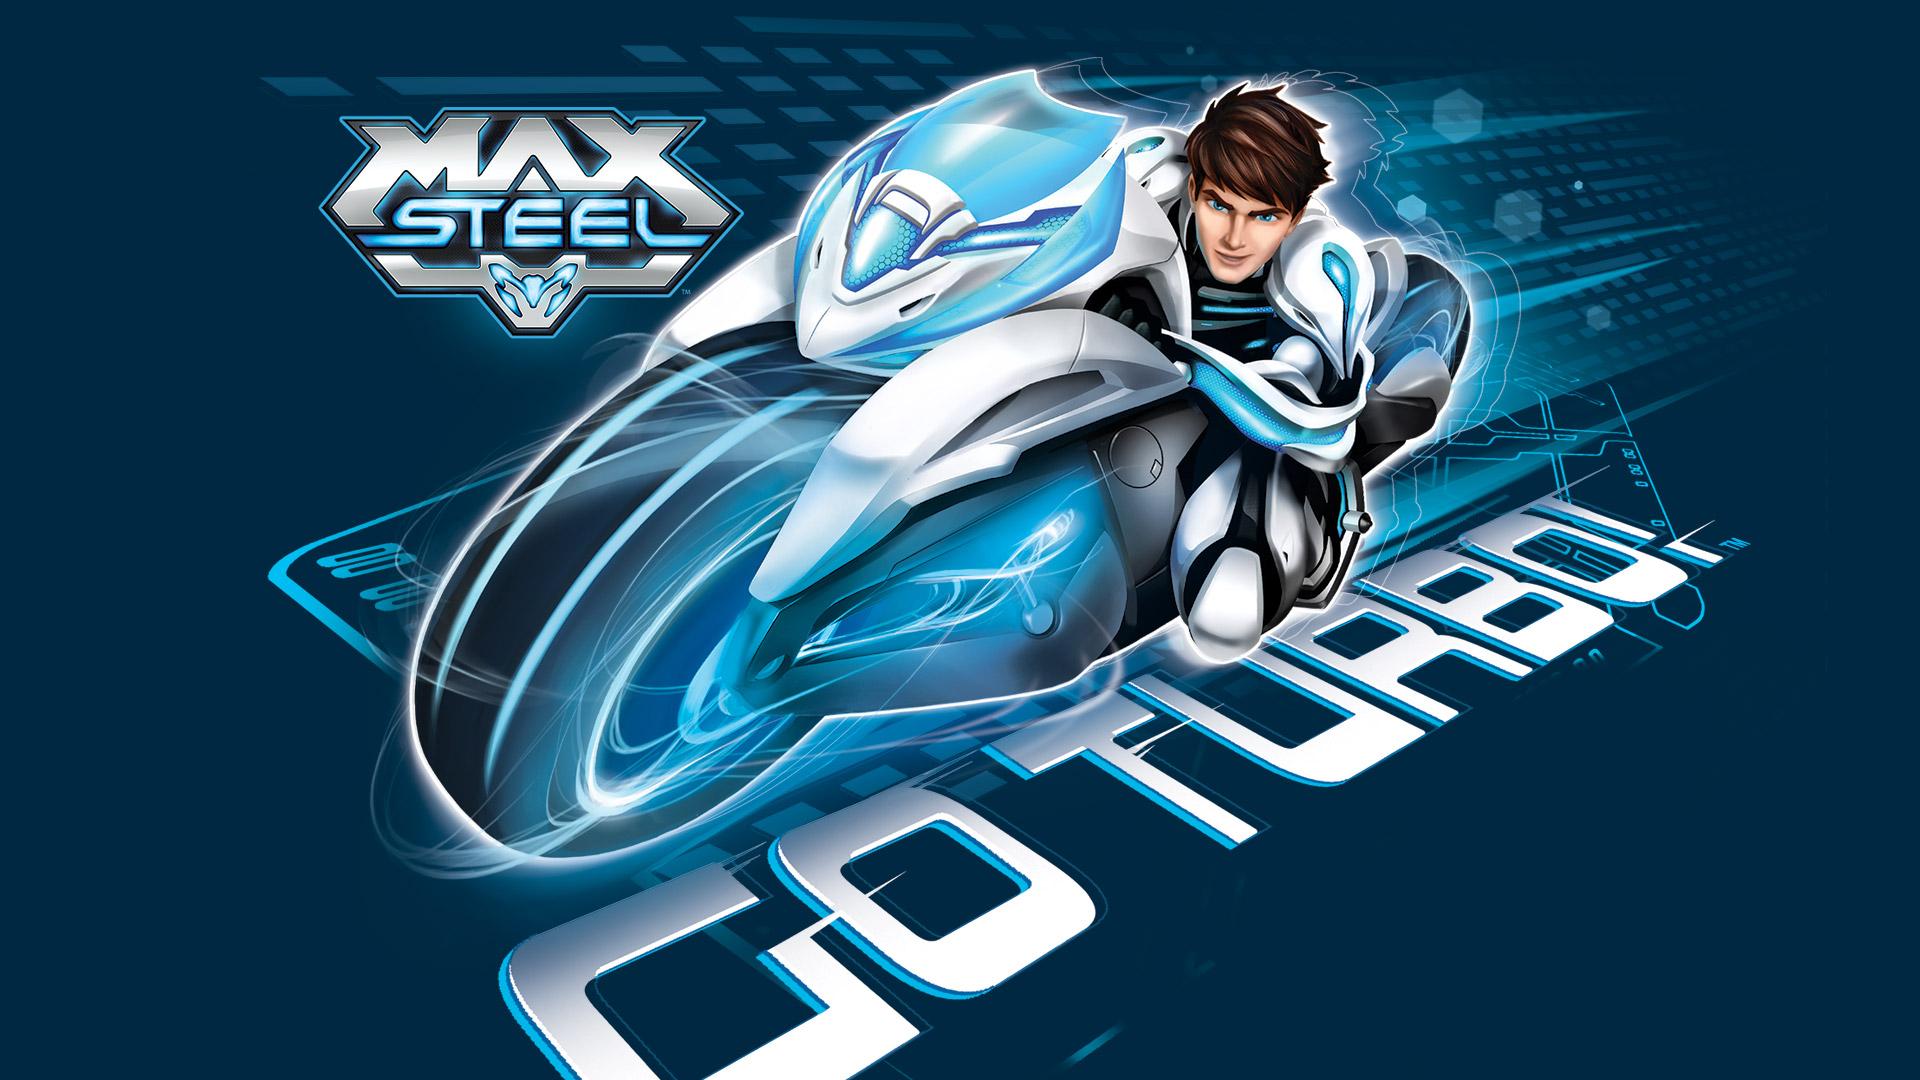 Max Steel - Movies & TV on Google Play